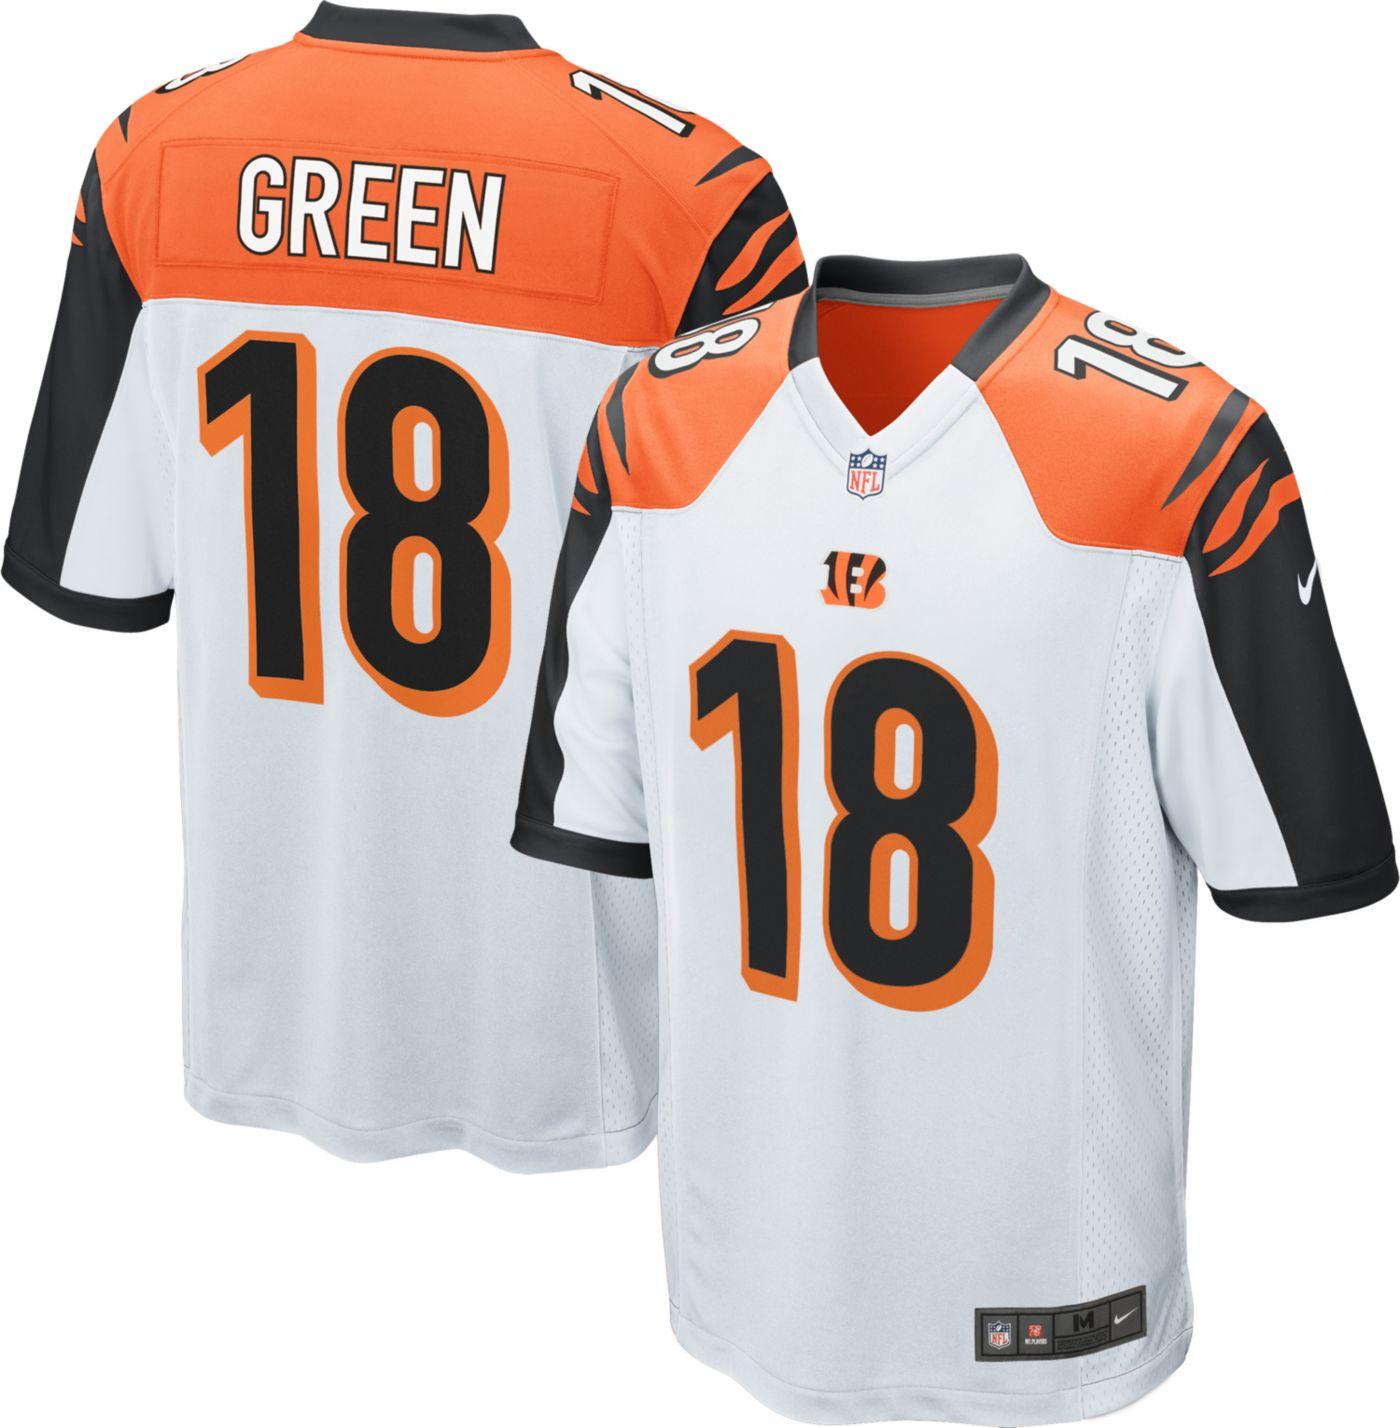 Nike Men's Away Game Jersey Cincinnati Bengals A.J. Green #18